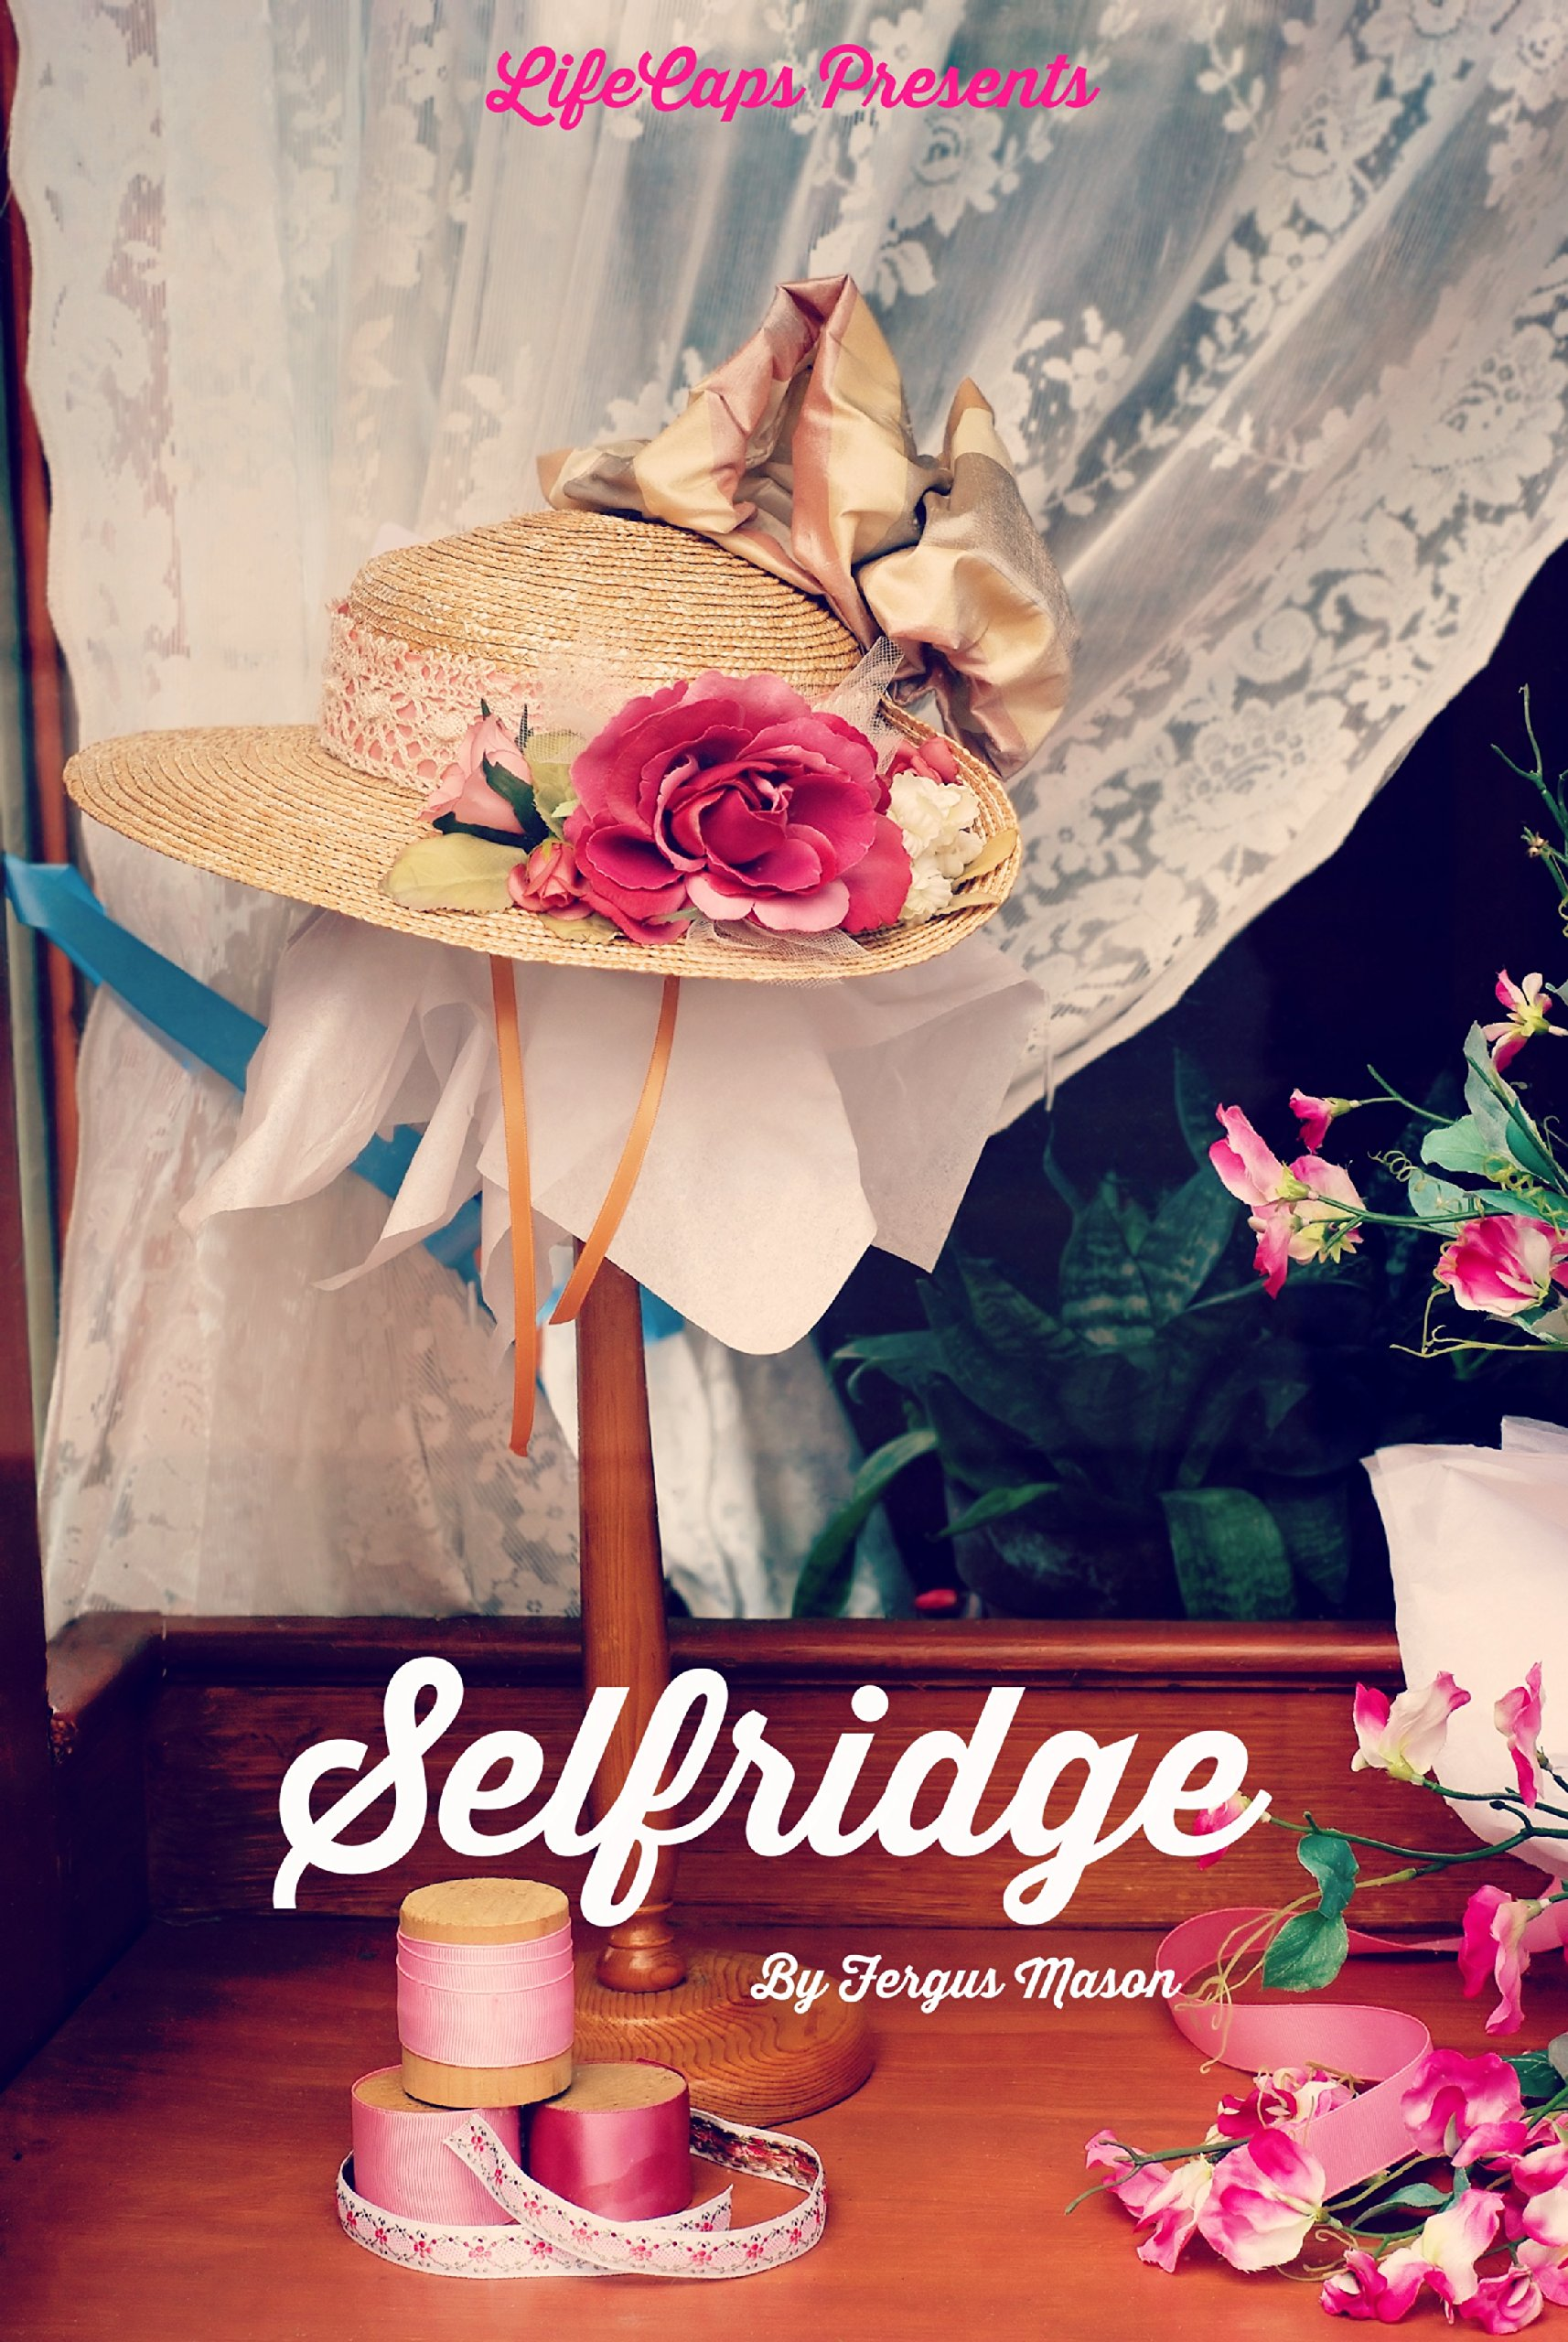 Selfridge: The Life and Times of Harry Gordon Selfridge